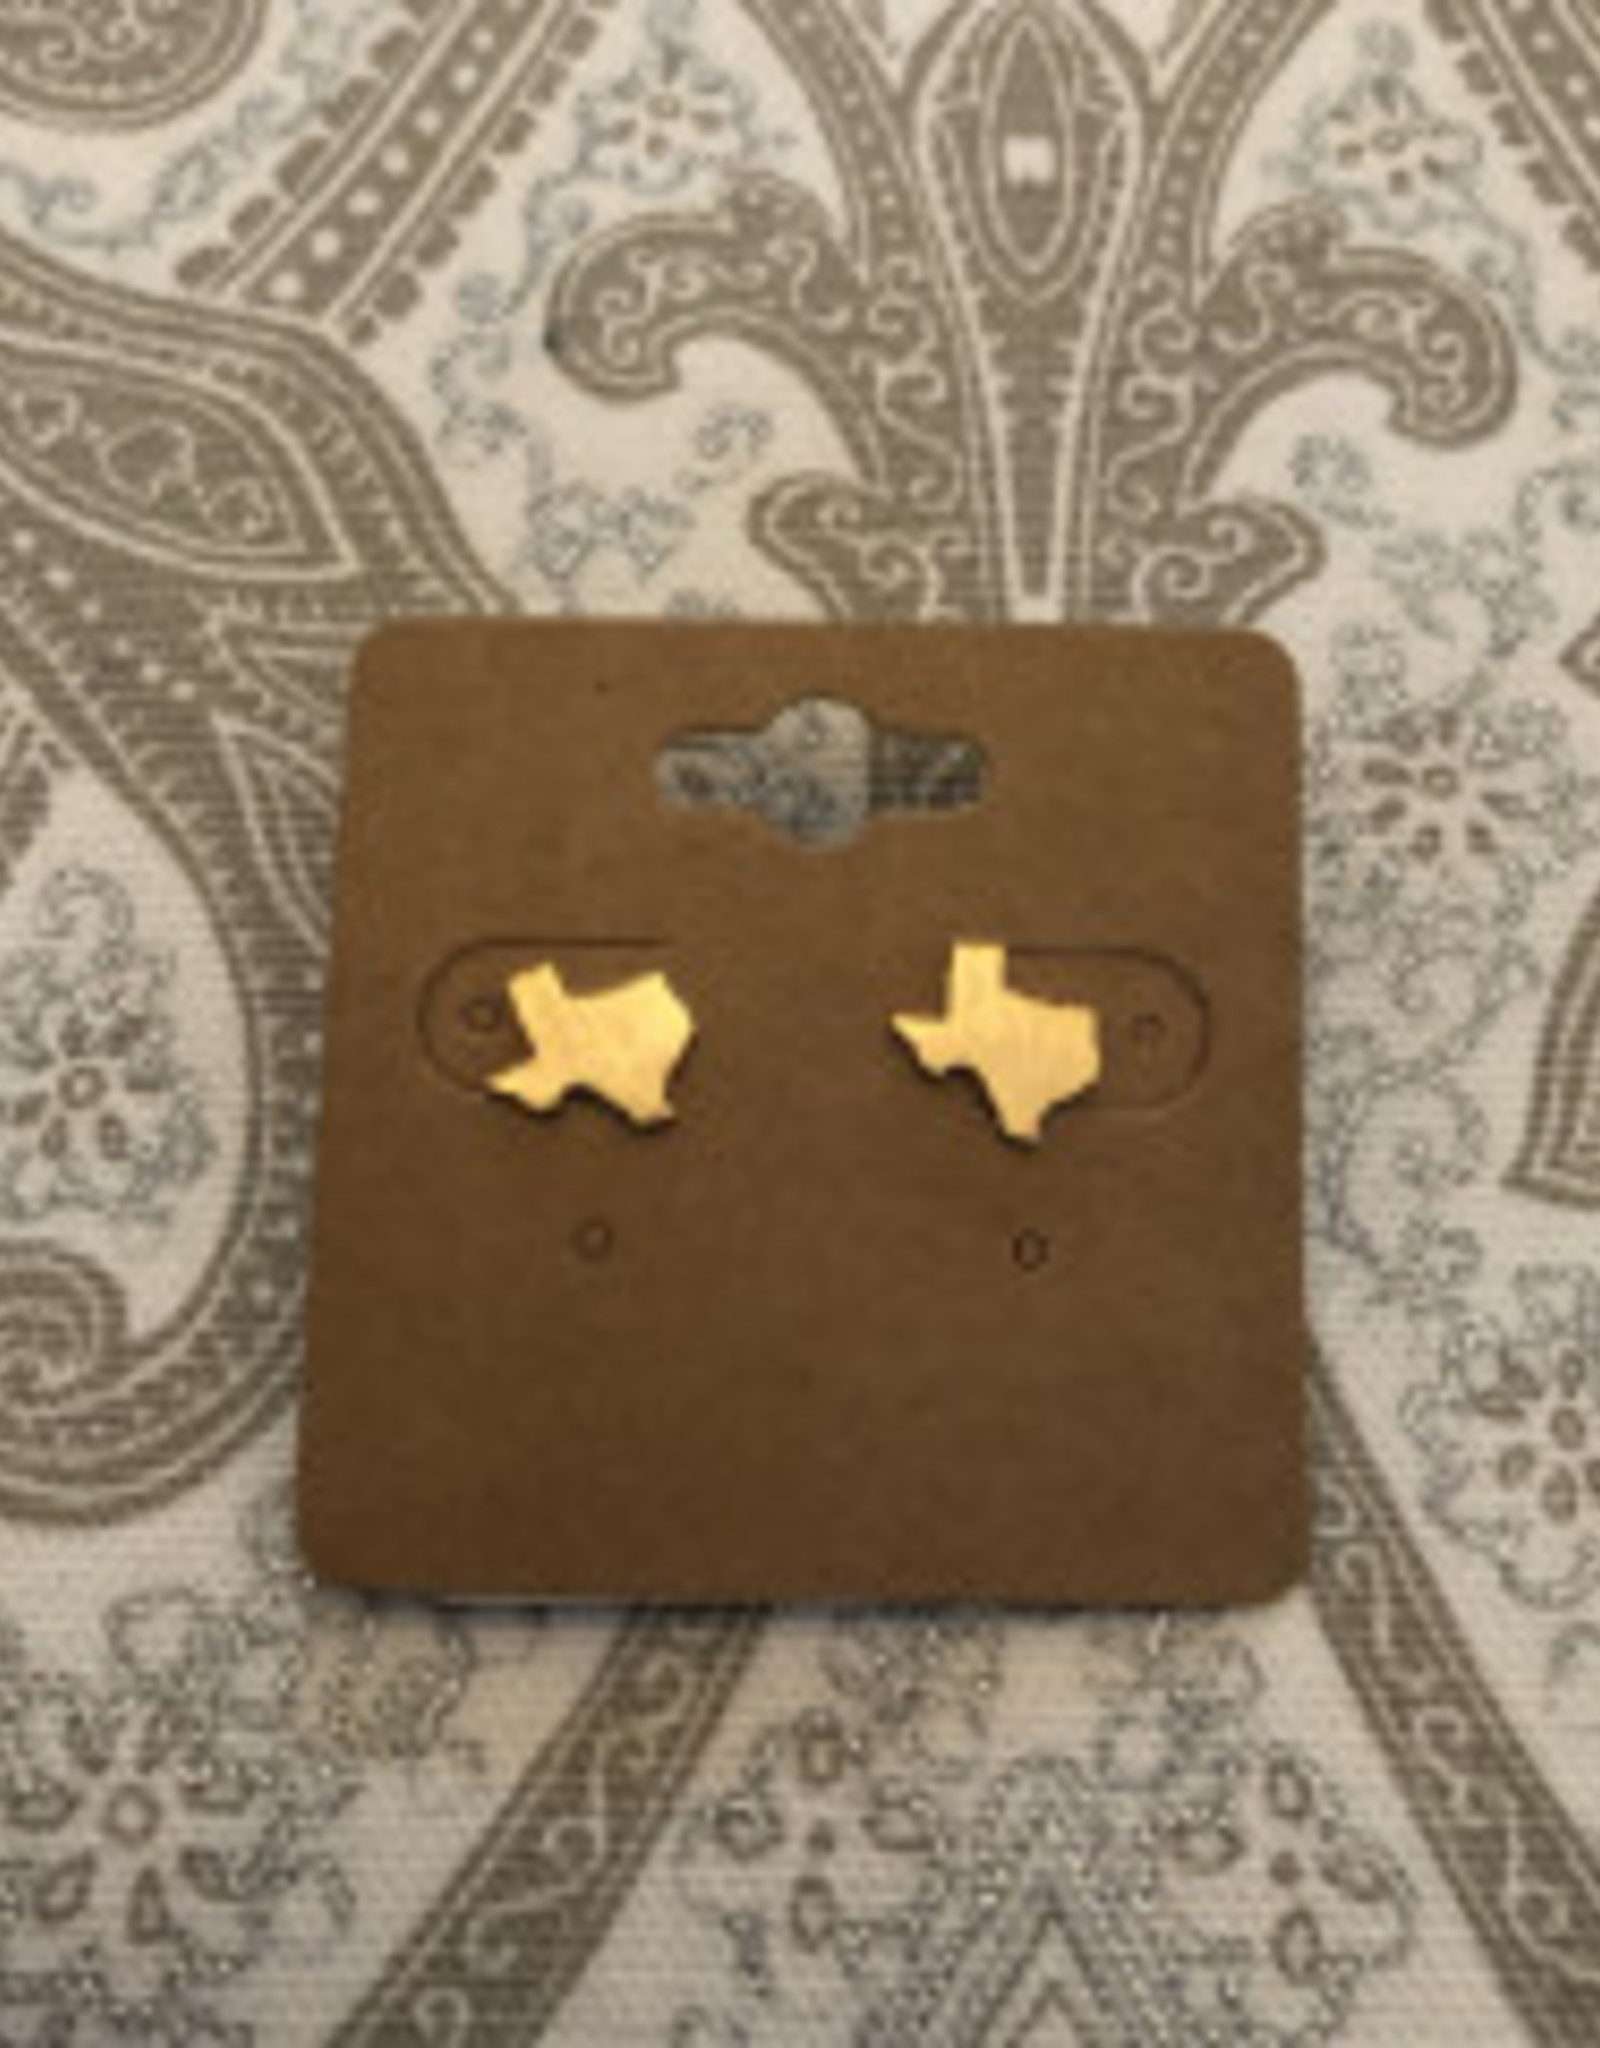 Wink Texas Stud Earrings